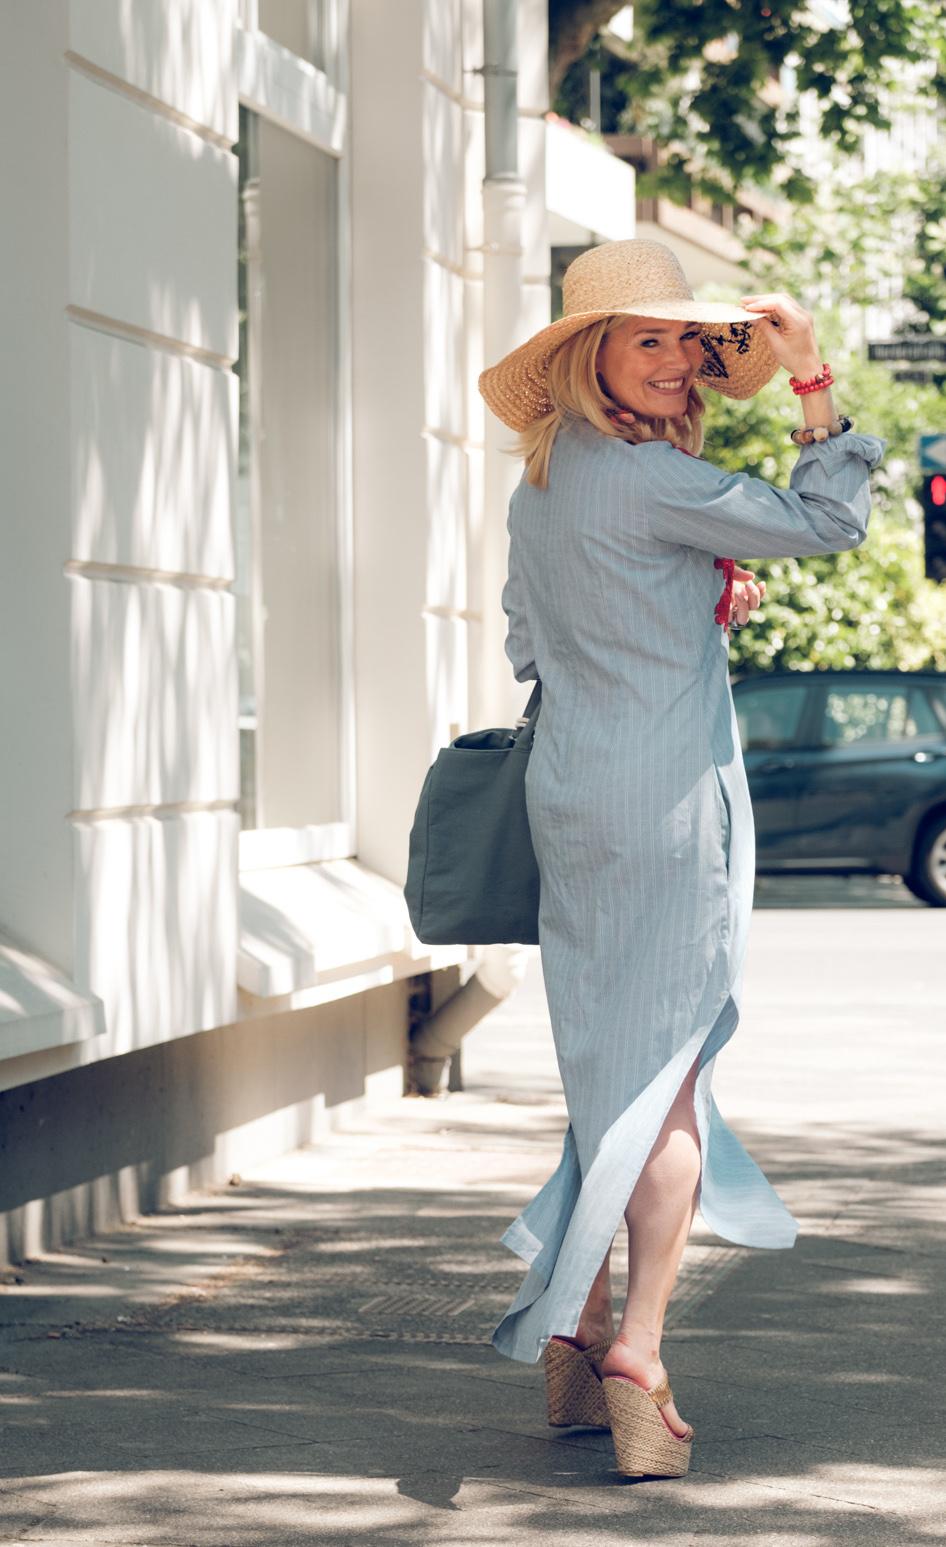 I&I Beautiful Dresses, Petra Dieners, Fashion-Blog, Lieblingsstil, com,3,